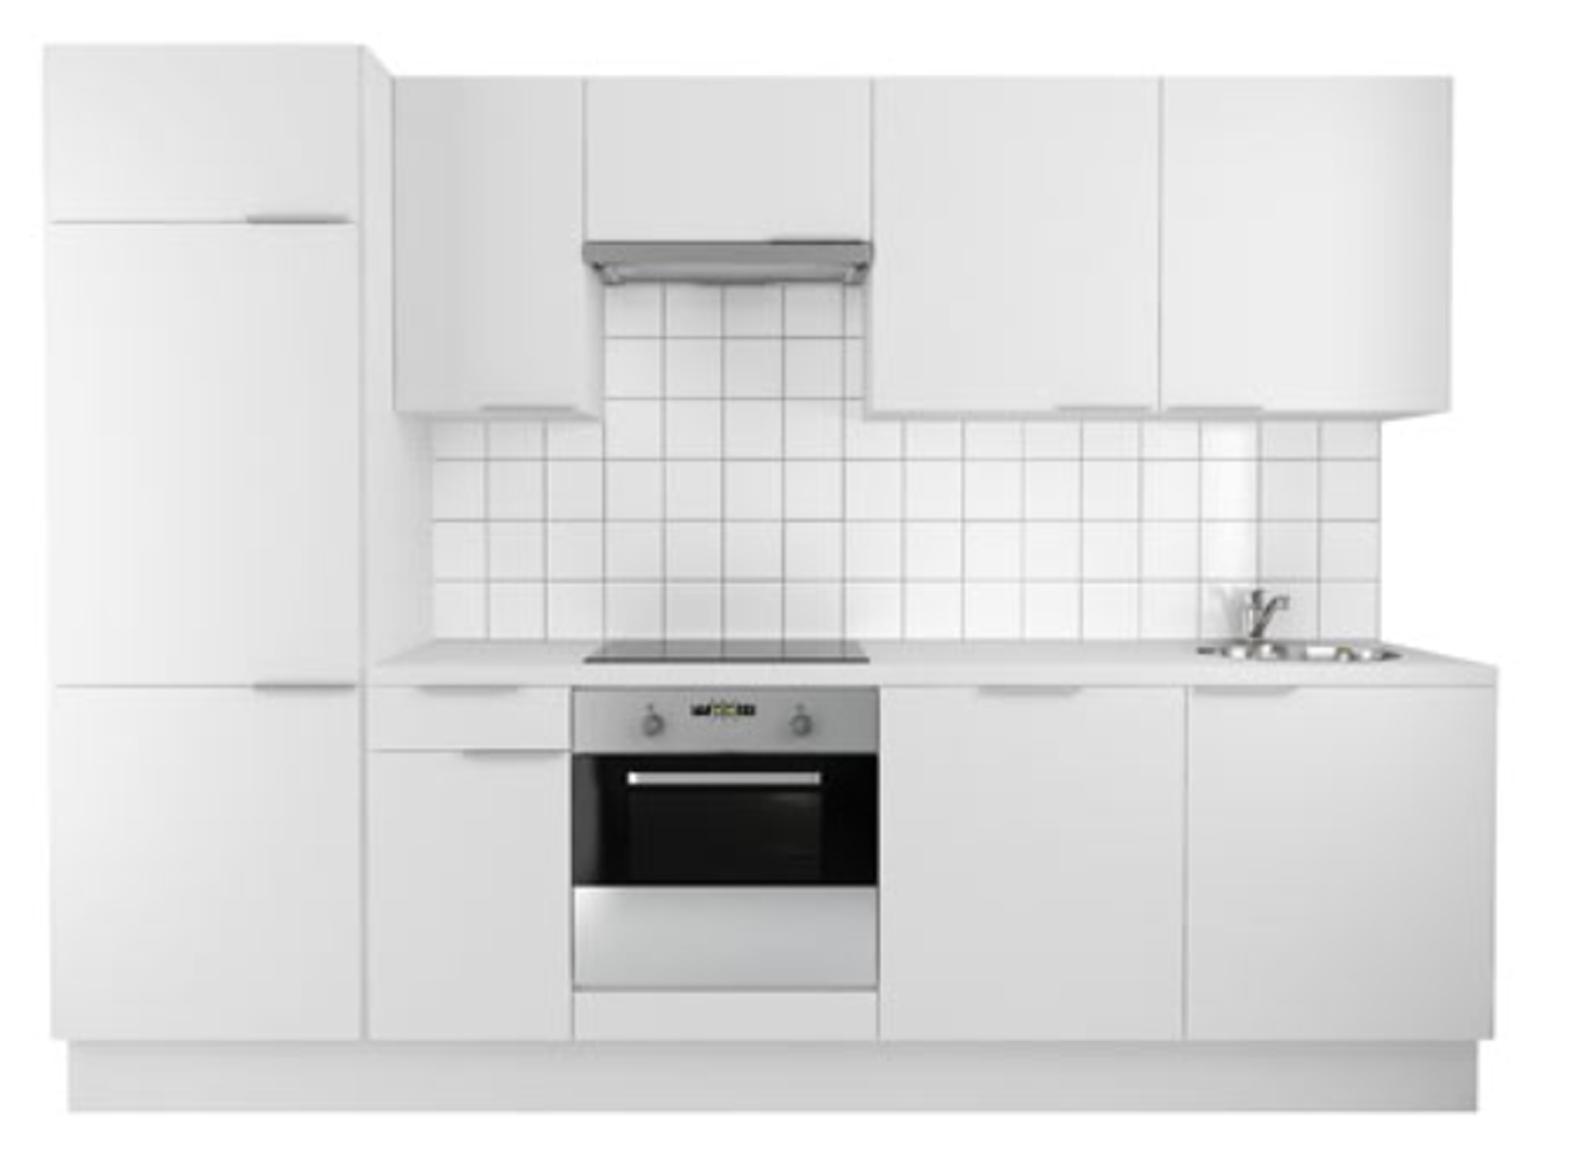 astuces d coration le blog de miss l 39 instant d 39 art. Black Bedroom Furniture Sets. Home Design Ideas